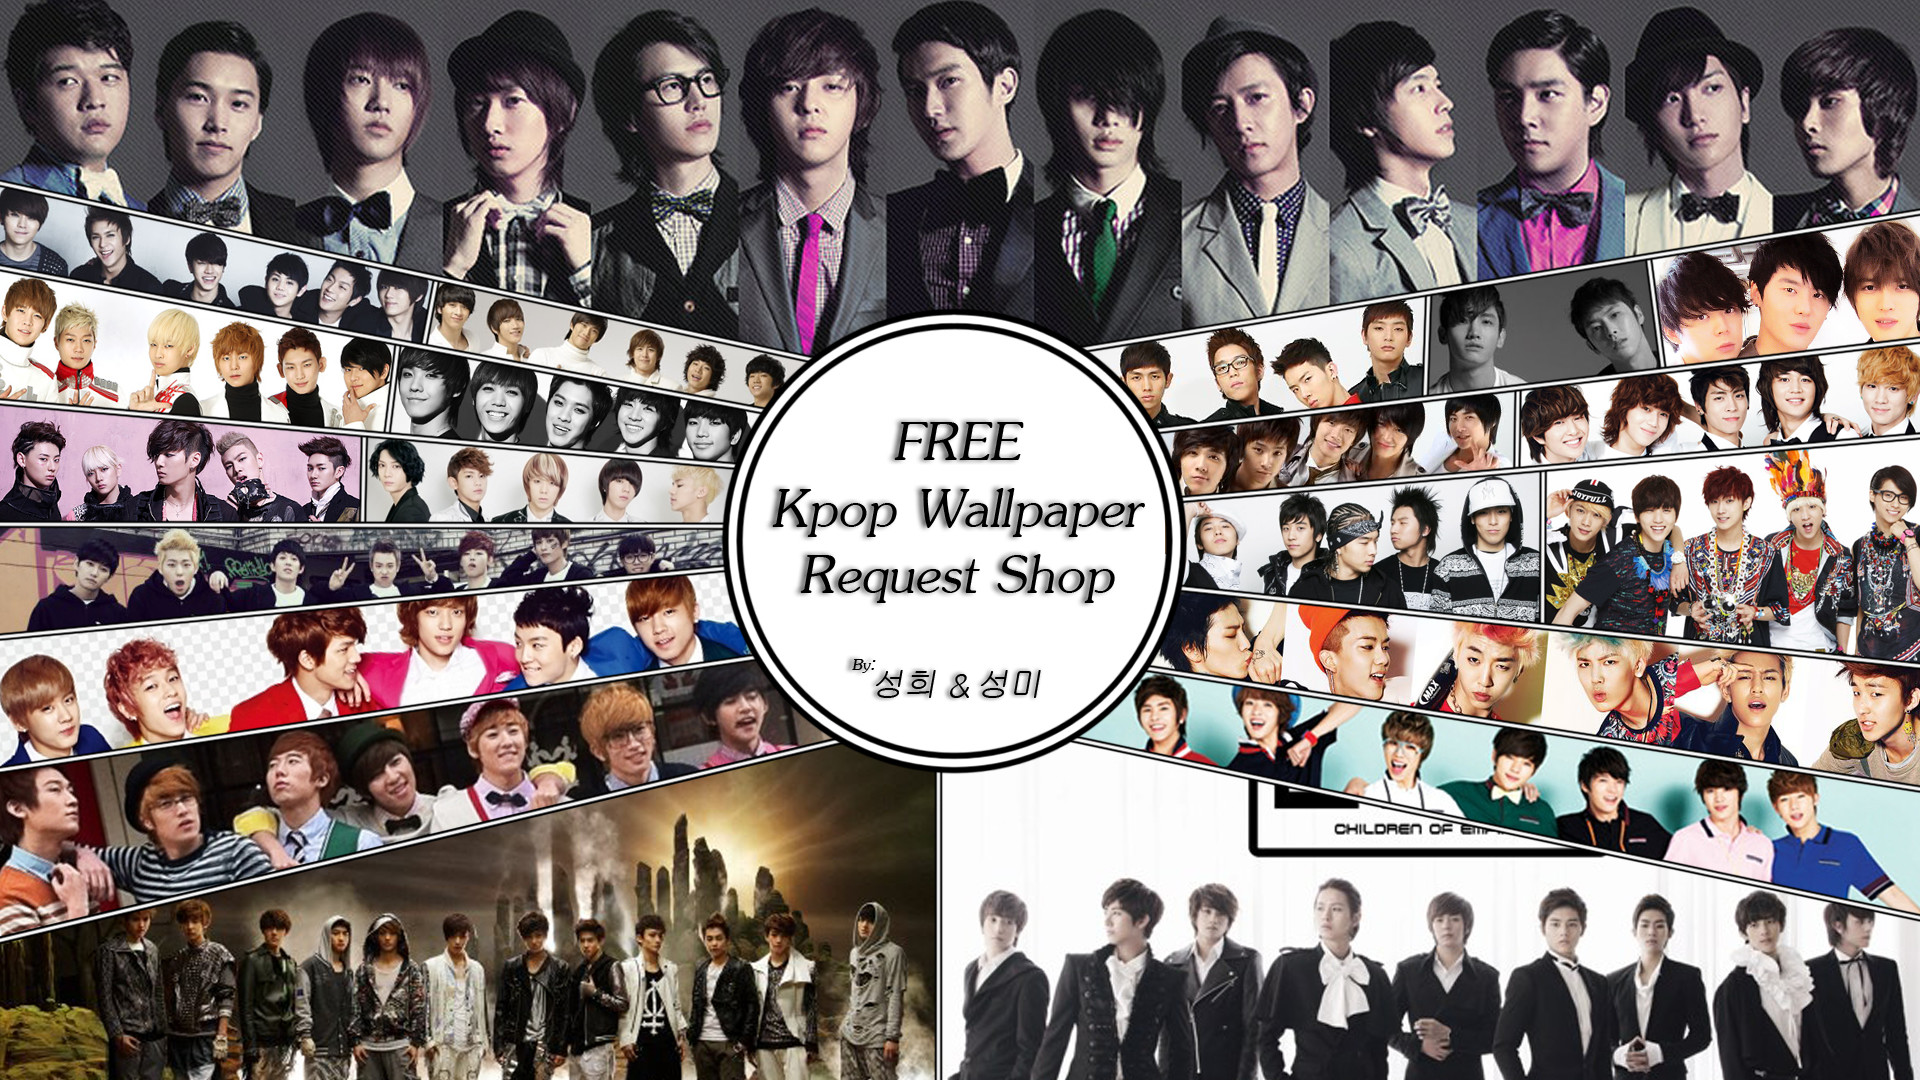 Kpop Wallpaper #1613176